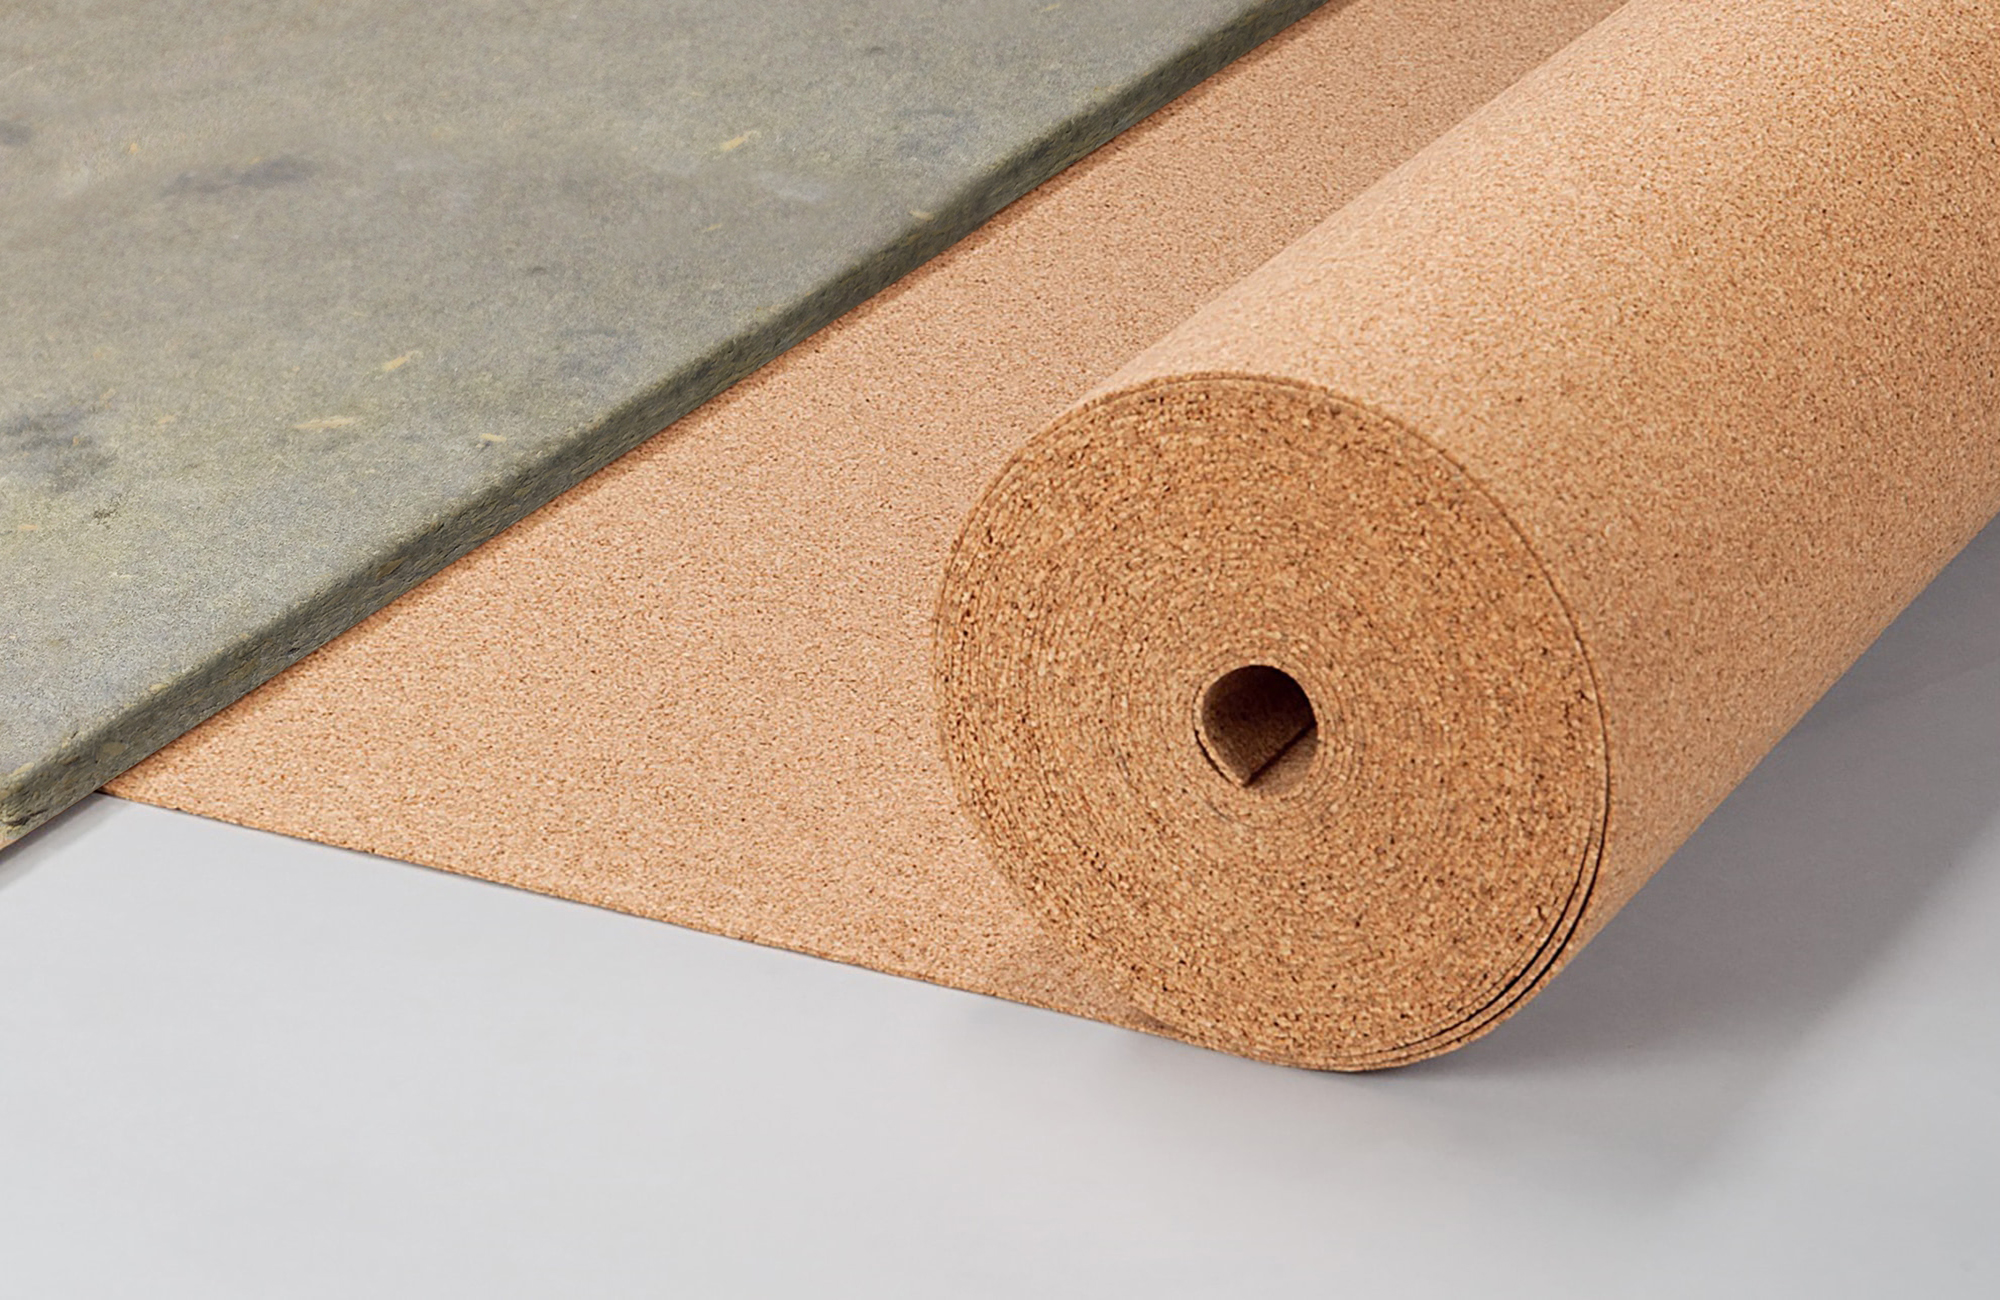 Rotolo isolante in sughero biondo posa betonwood